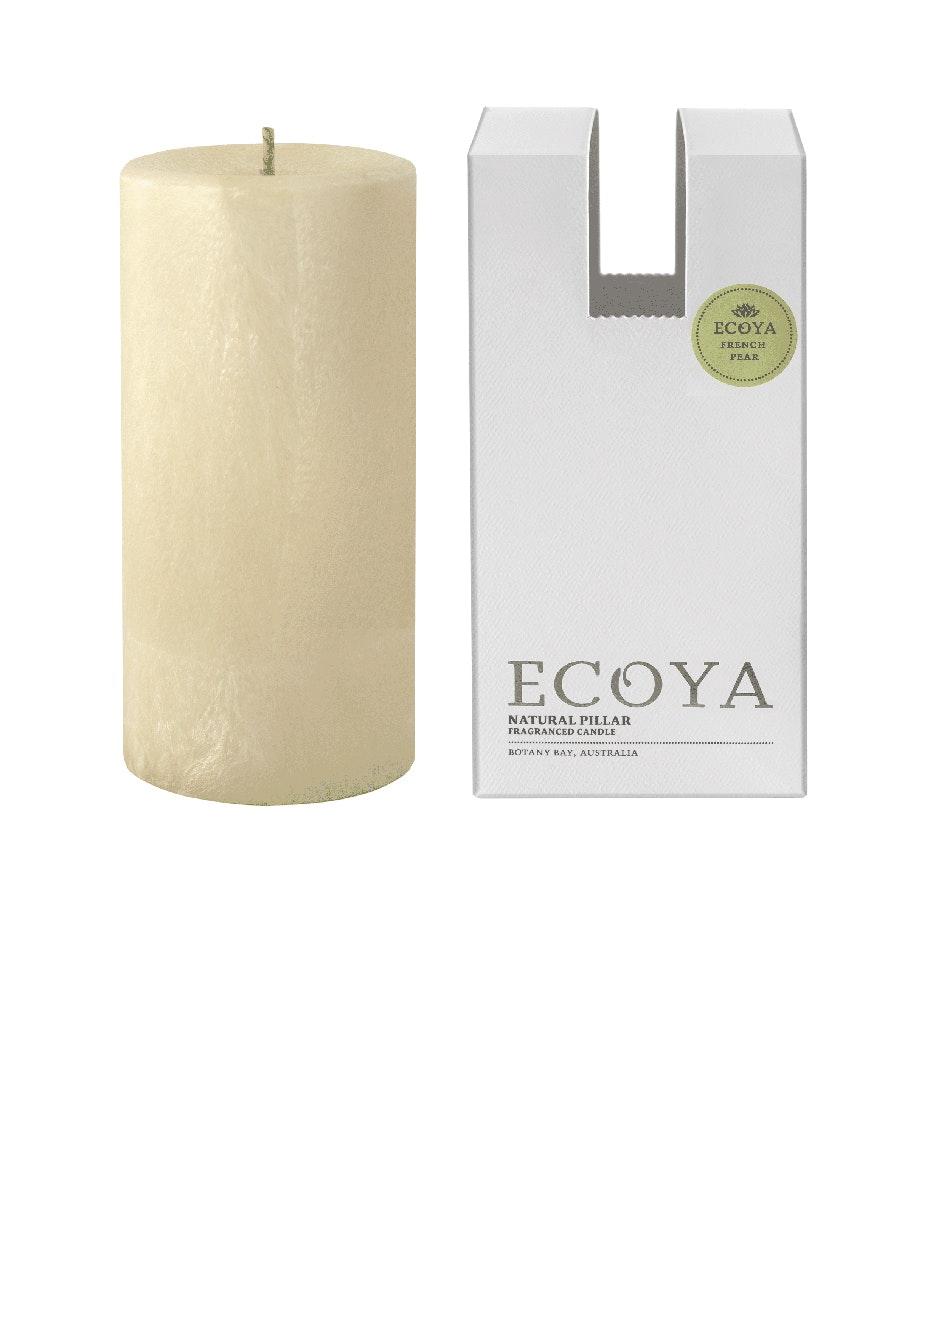 Ecoya - Pillar 75x155 Natural - French Pear